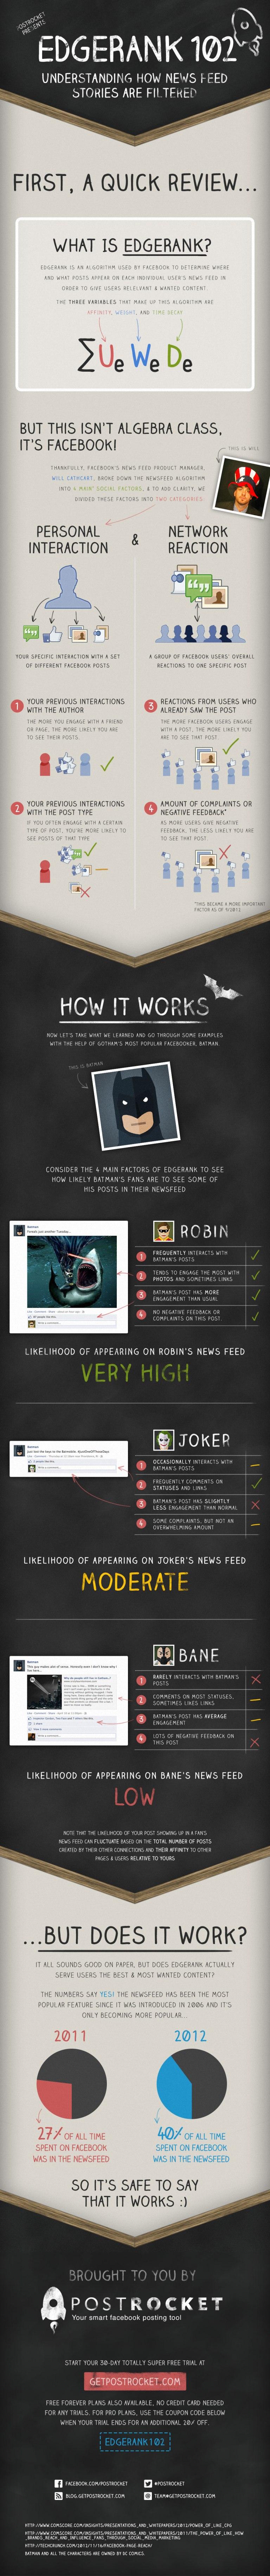 Postrocket Facebook infography